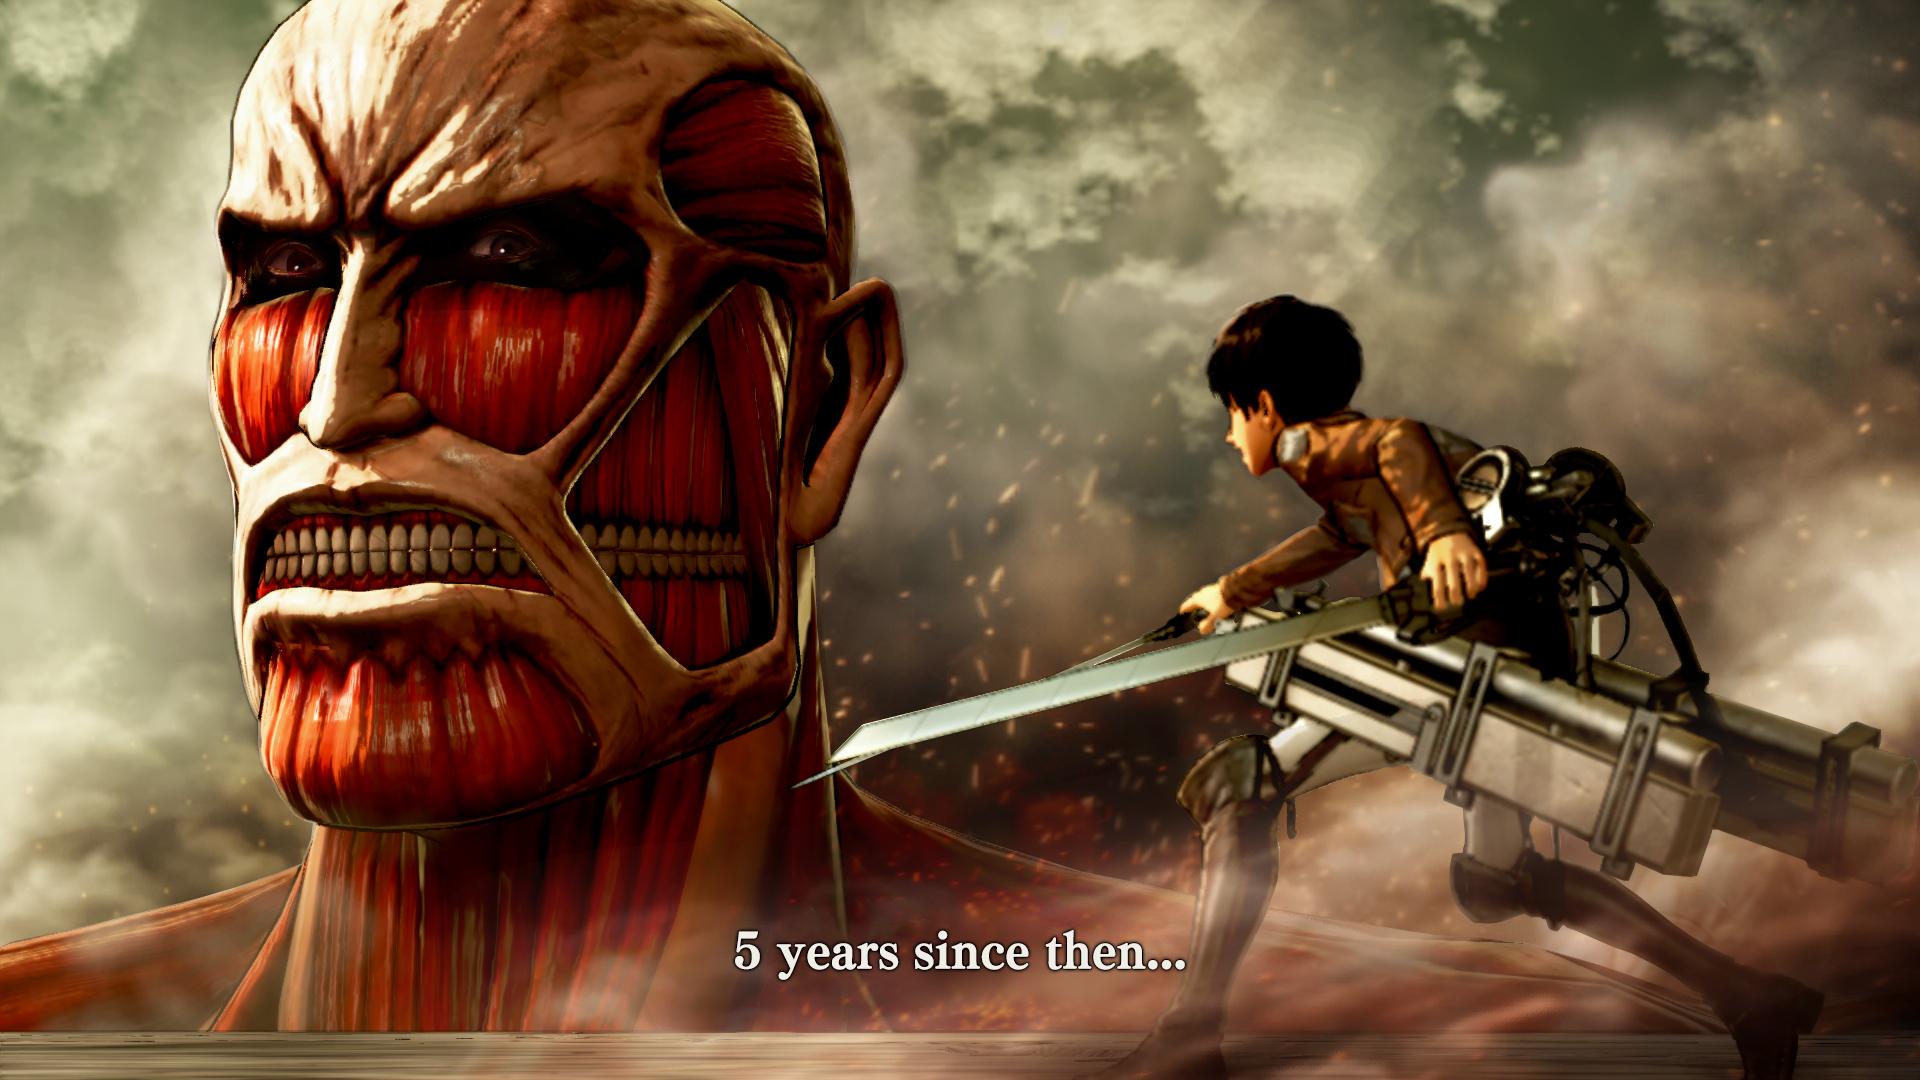 Attack On Titan 2 Game Colossal Titan 1920x1080 Wallpaper Teahub Io